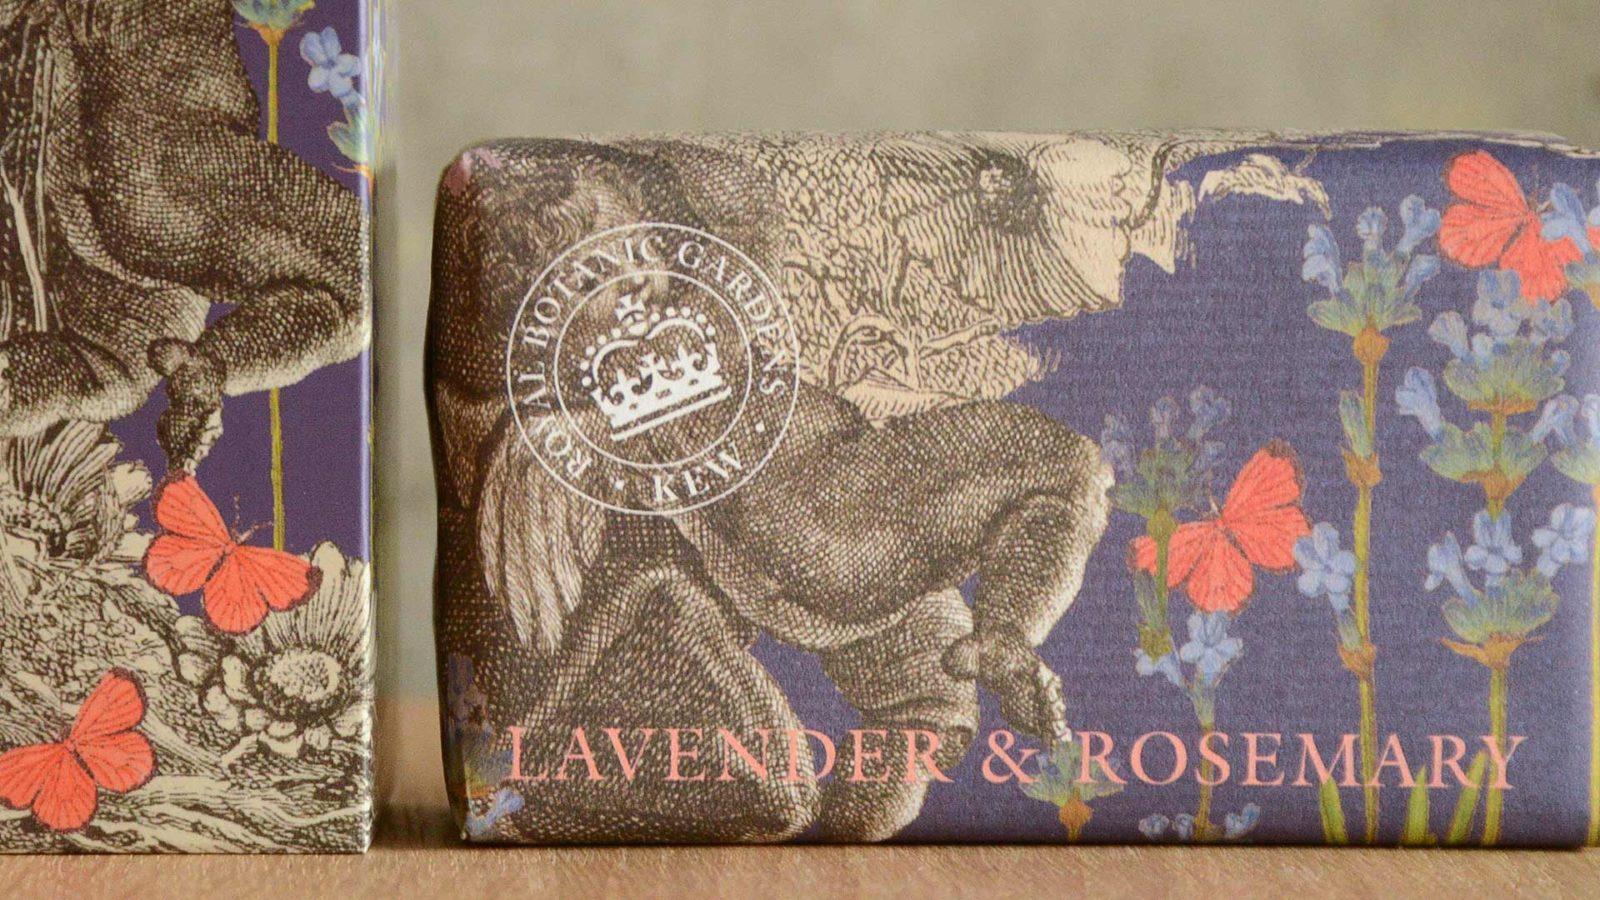 Kew Gardens hand care set lavender & rosemary